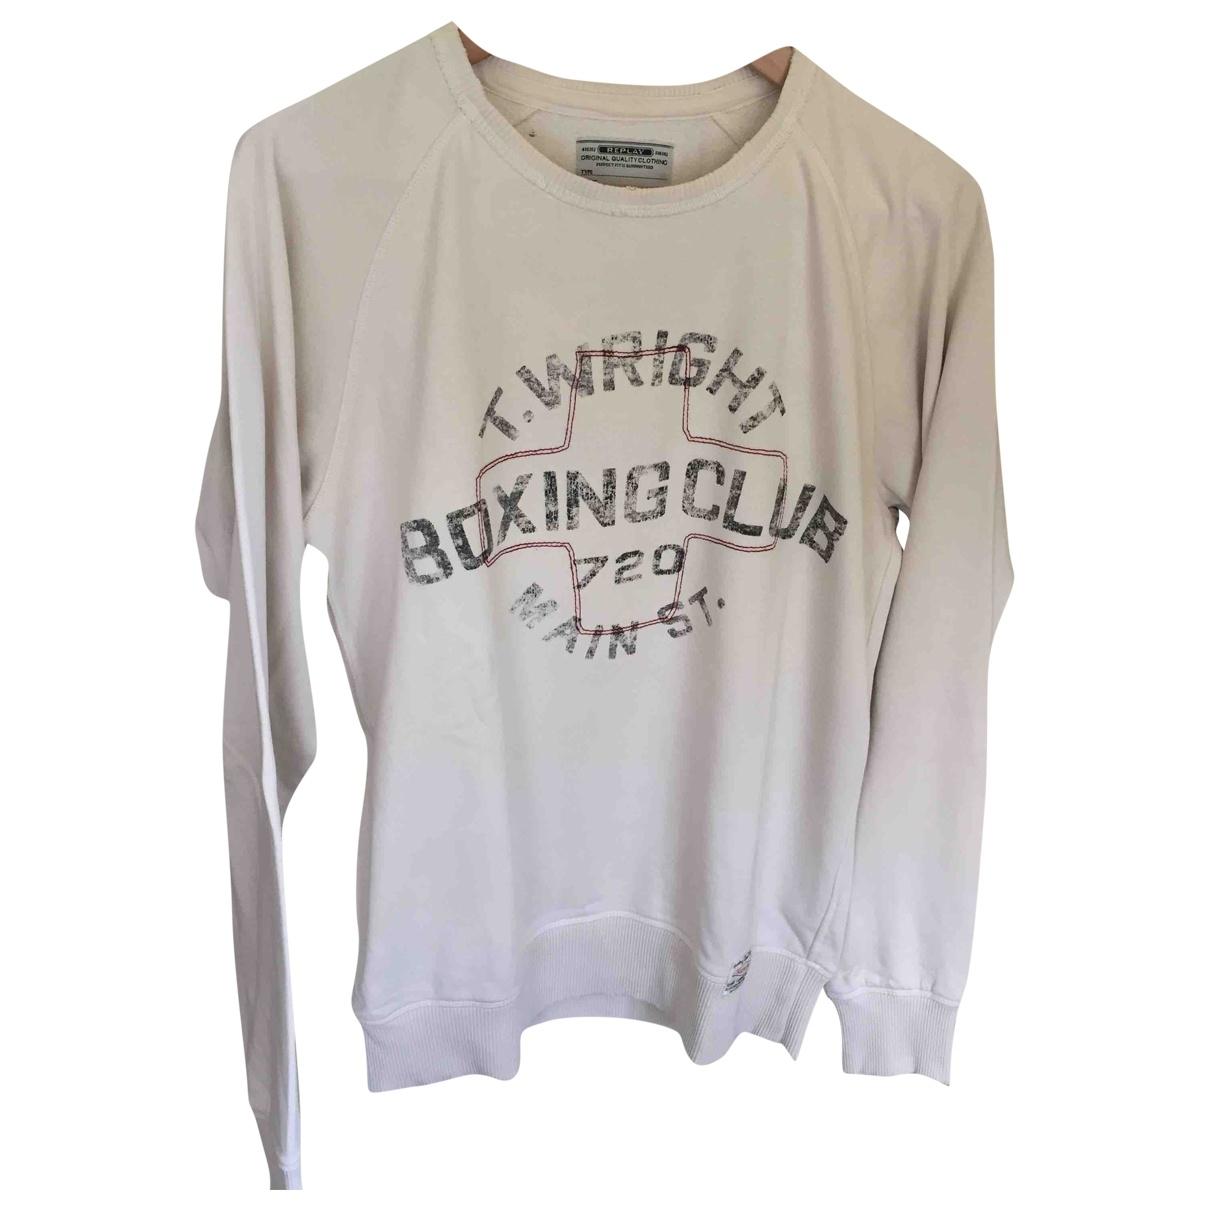 Replay \N Ecru Cotton Knitwear & Sweatshirts for Men S International